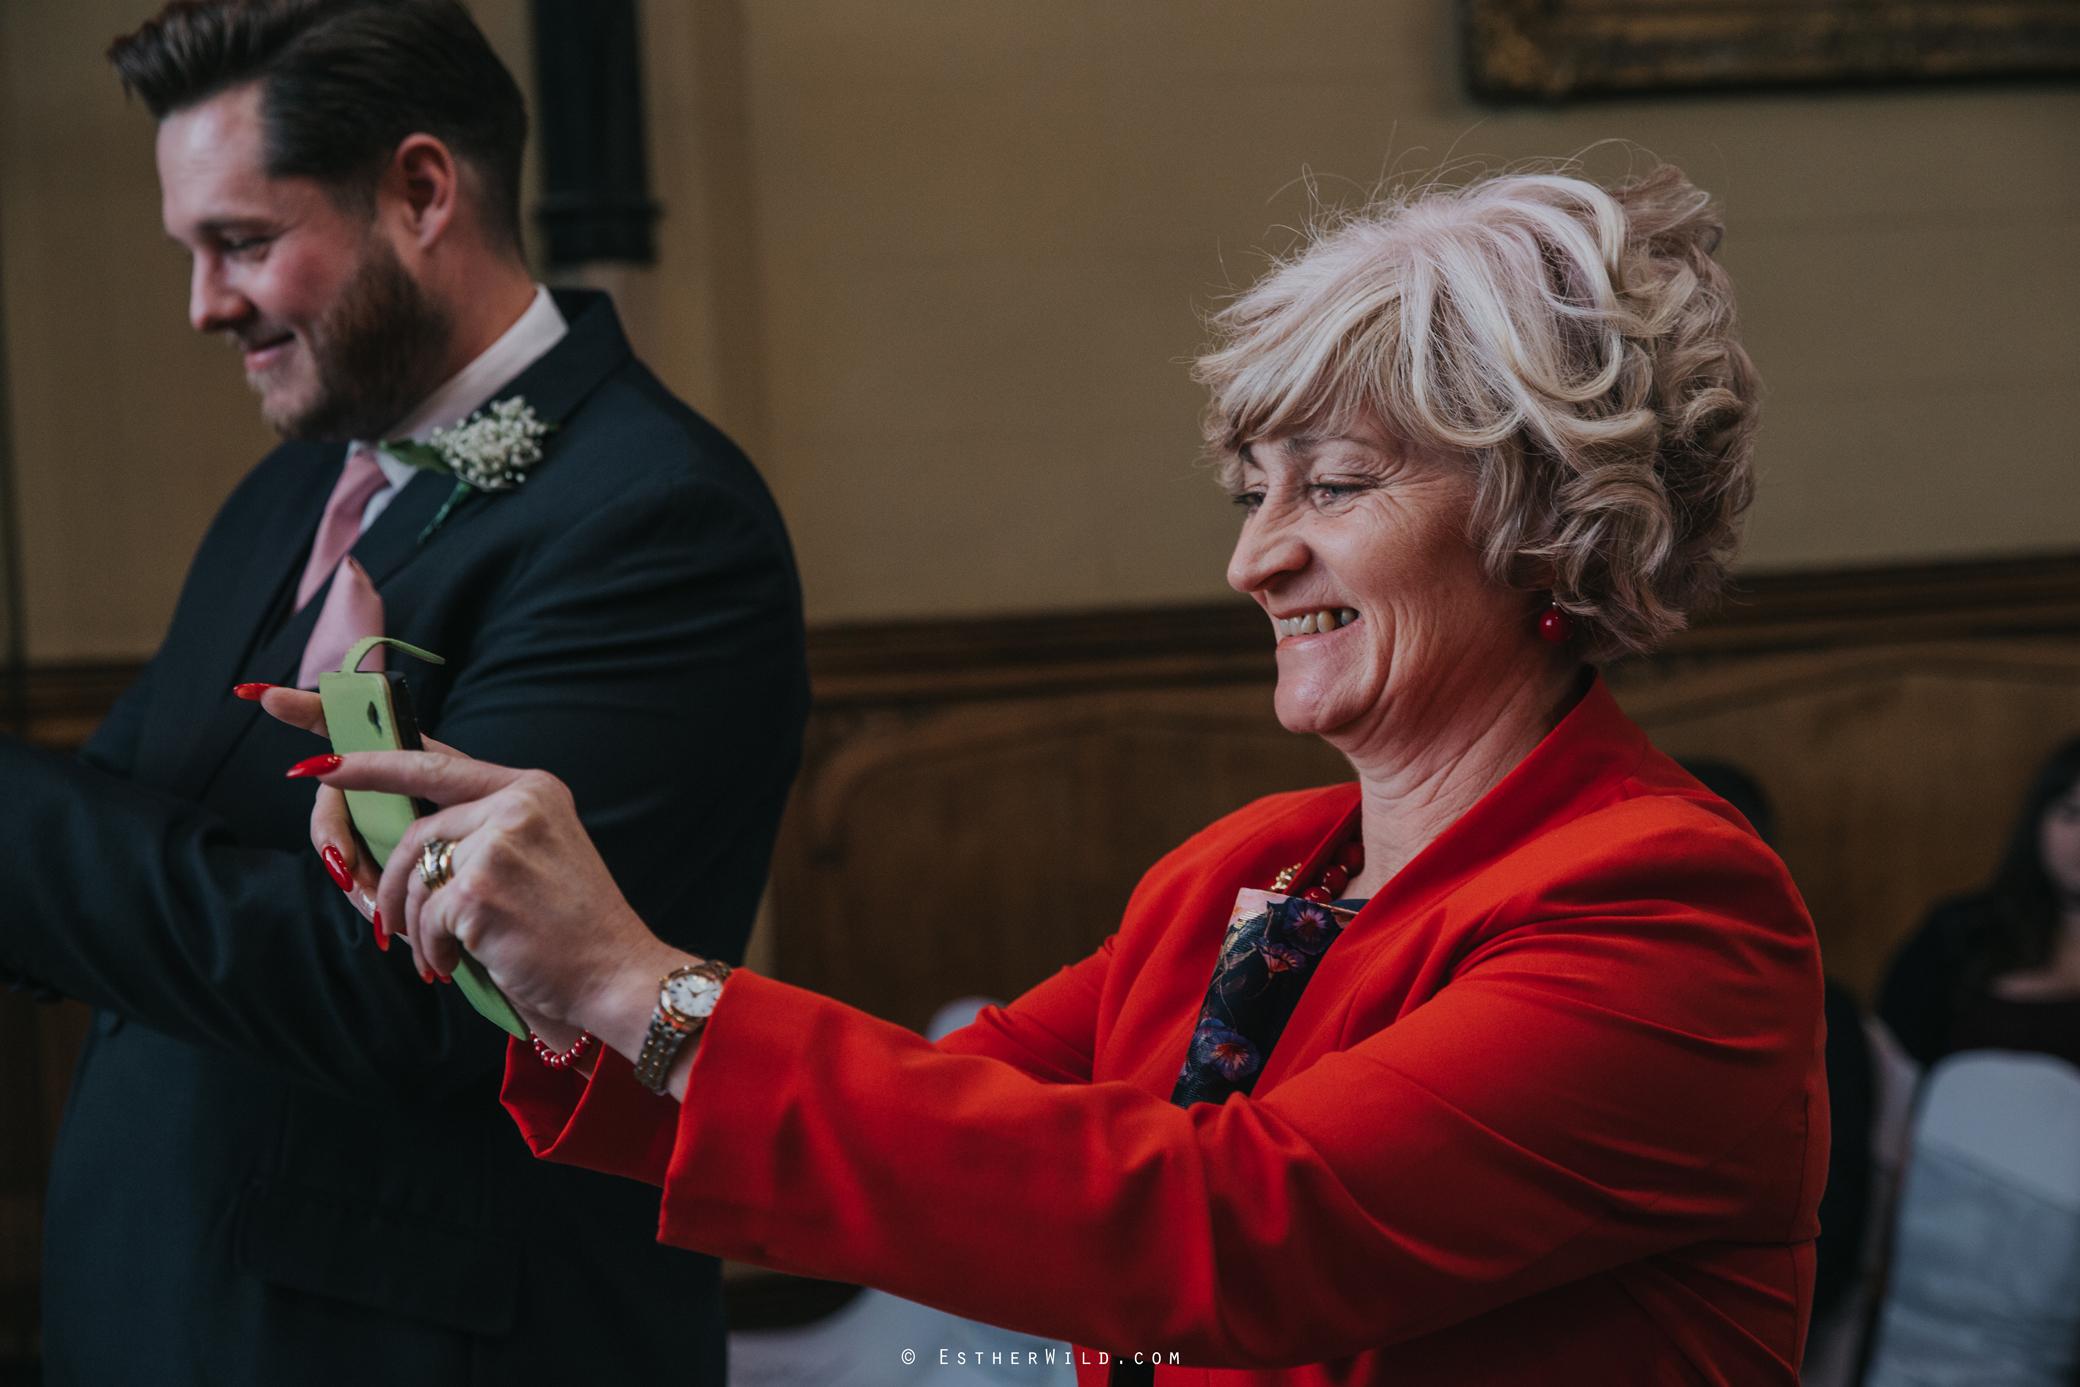 Wedding_Kings_Lynn_Town_Hall_Norfolk_Photographer_Esther_Wild_IMG_1163.jpg